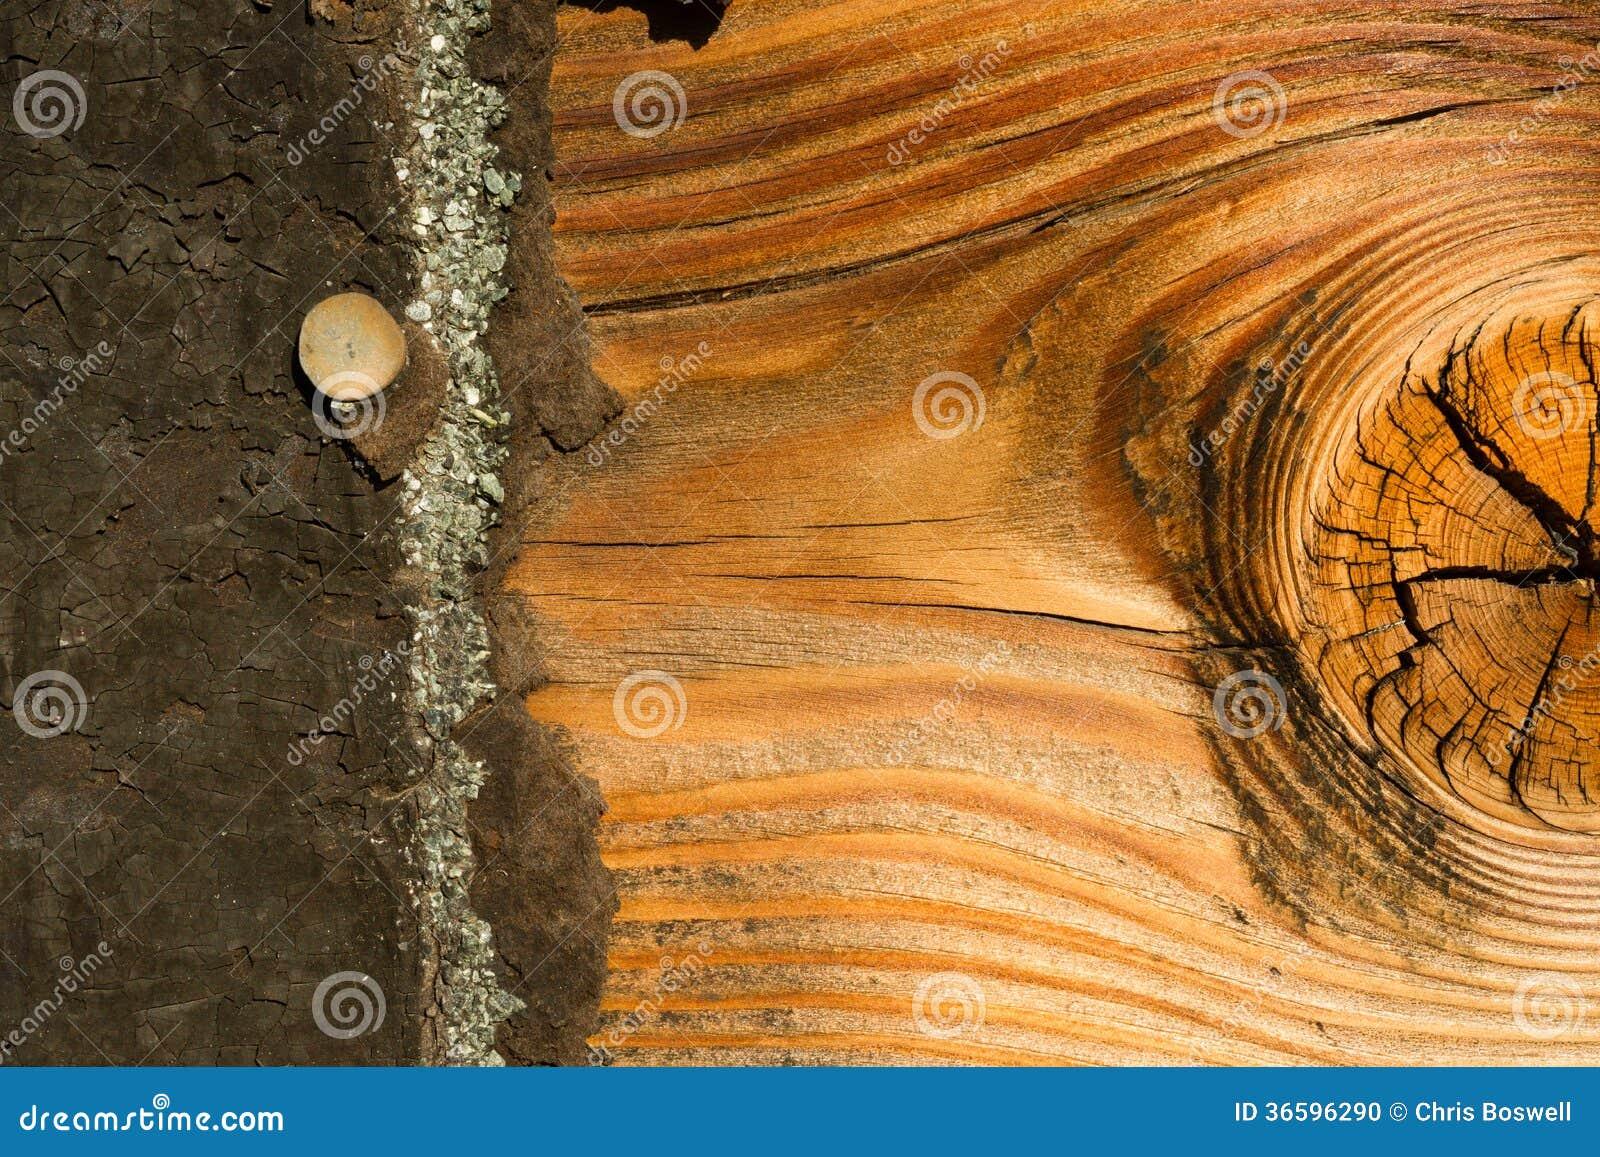 Knotty Pine Board Weathered Wood Asphalt Shingle Roofing